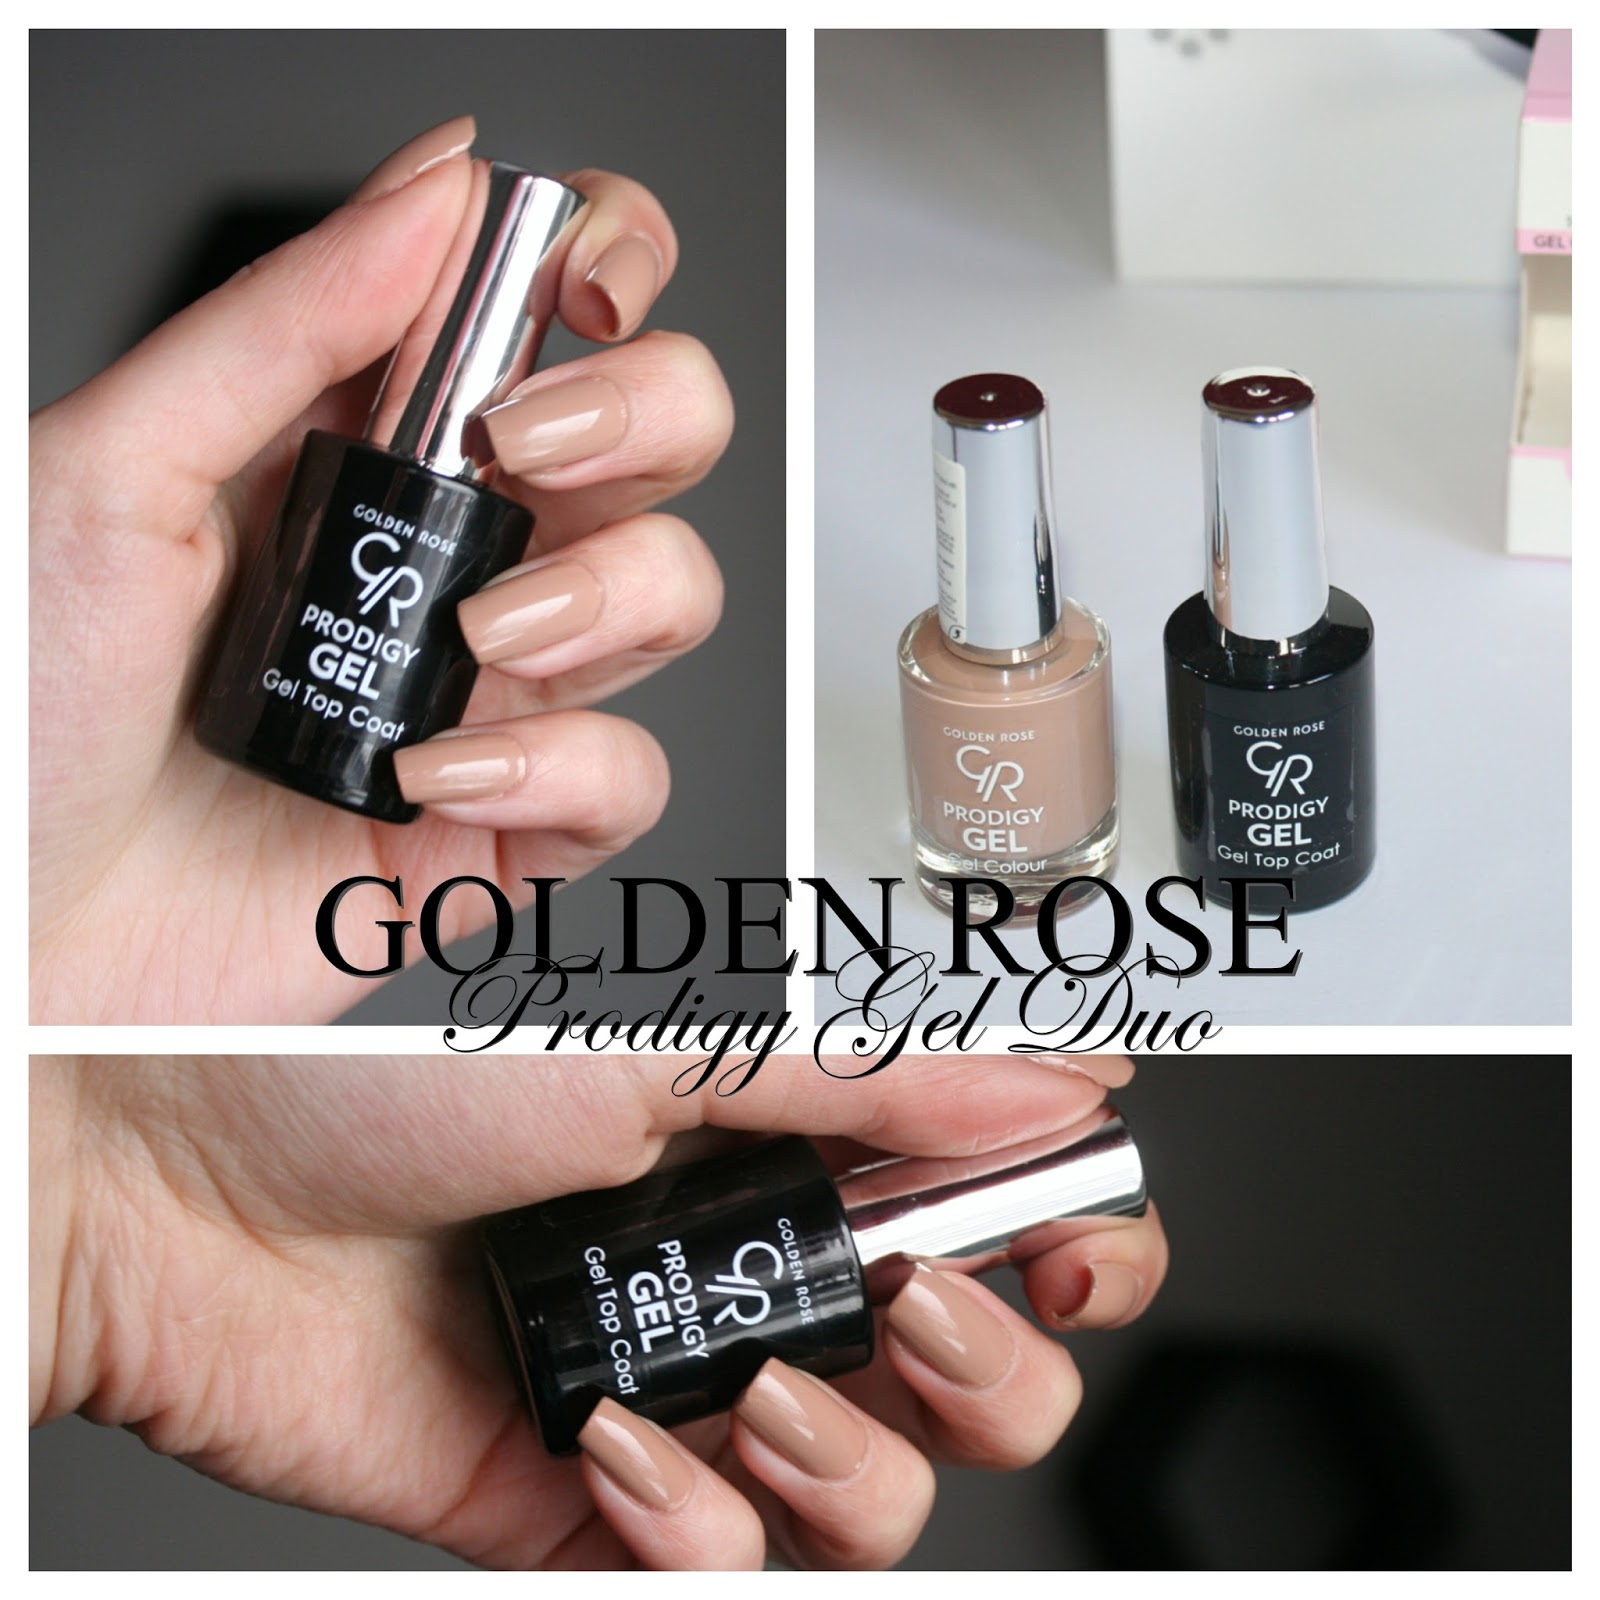 Golden Rose Prodigy Gel Duo Lakovi Za Nokte Recenzija Arkona Make Up And More